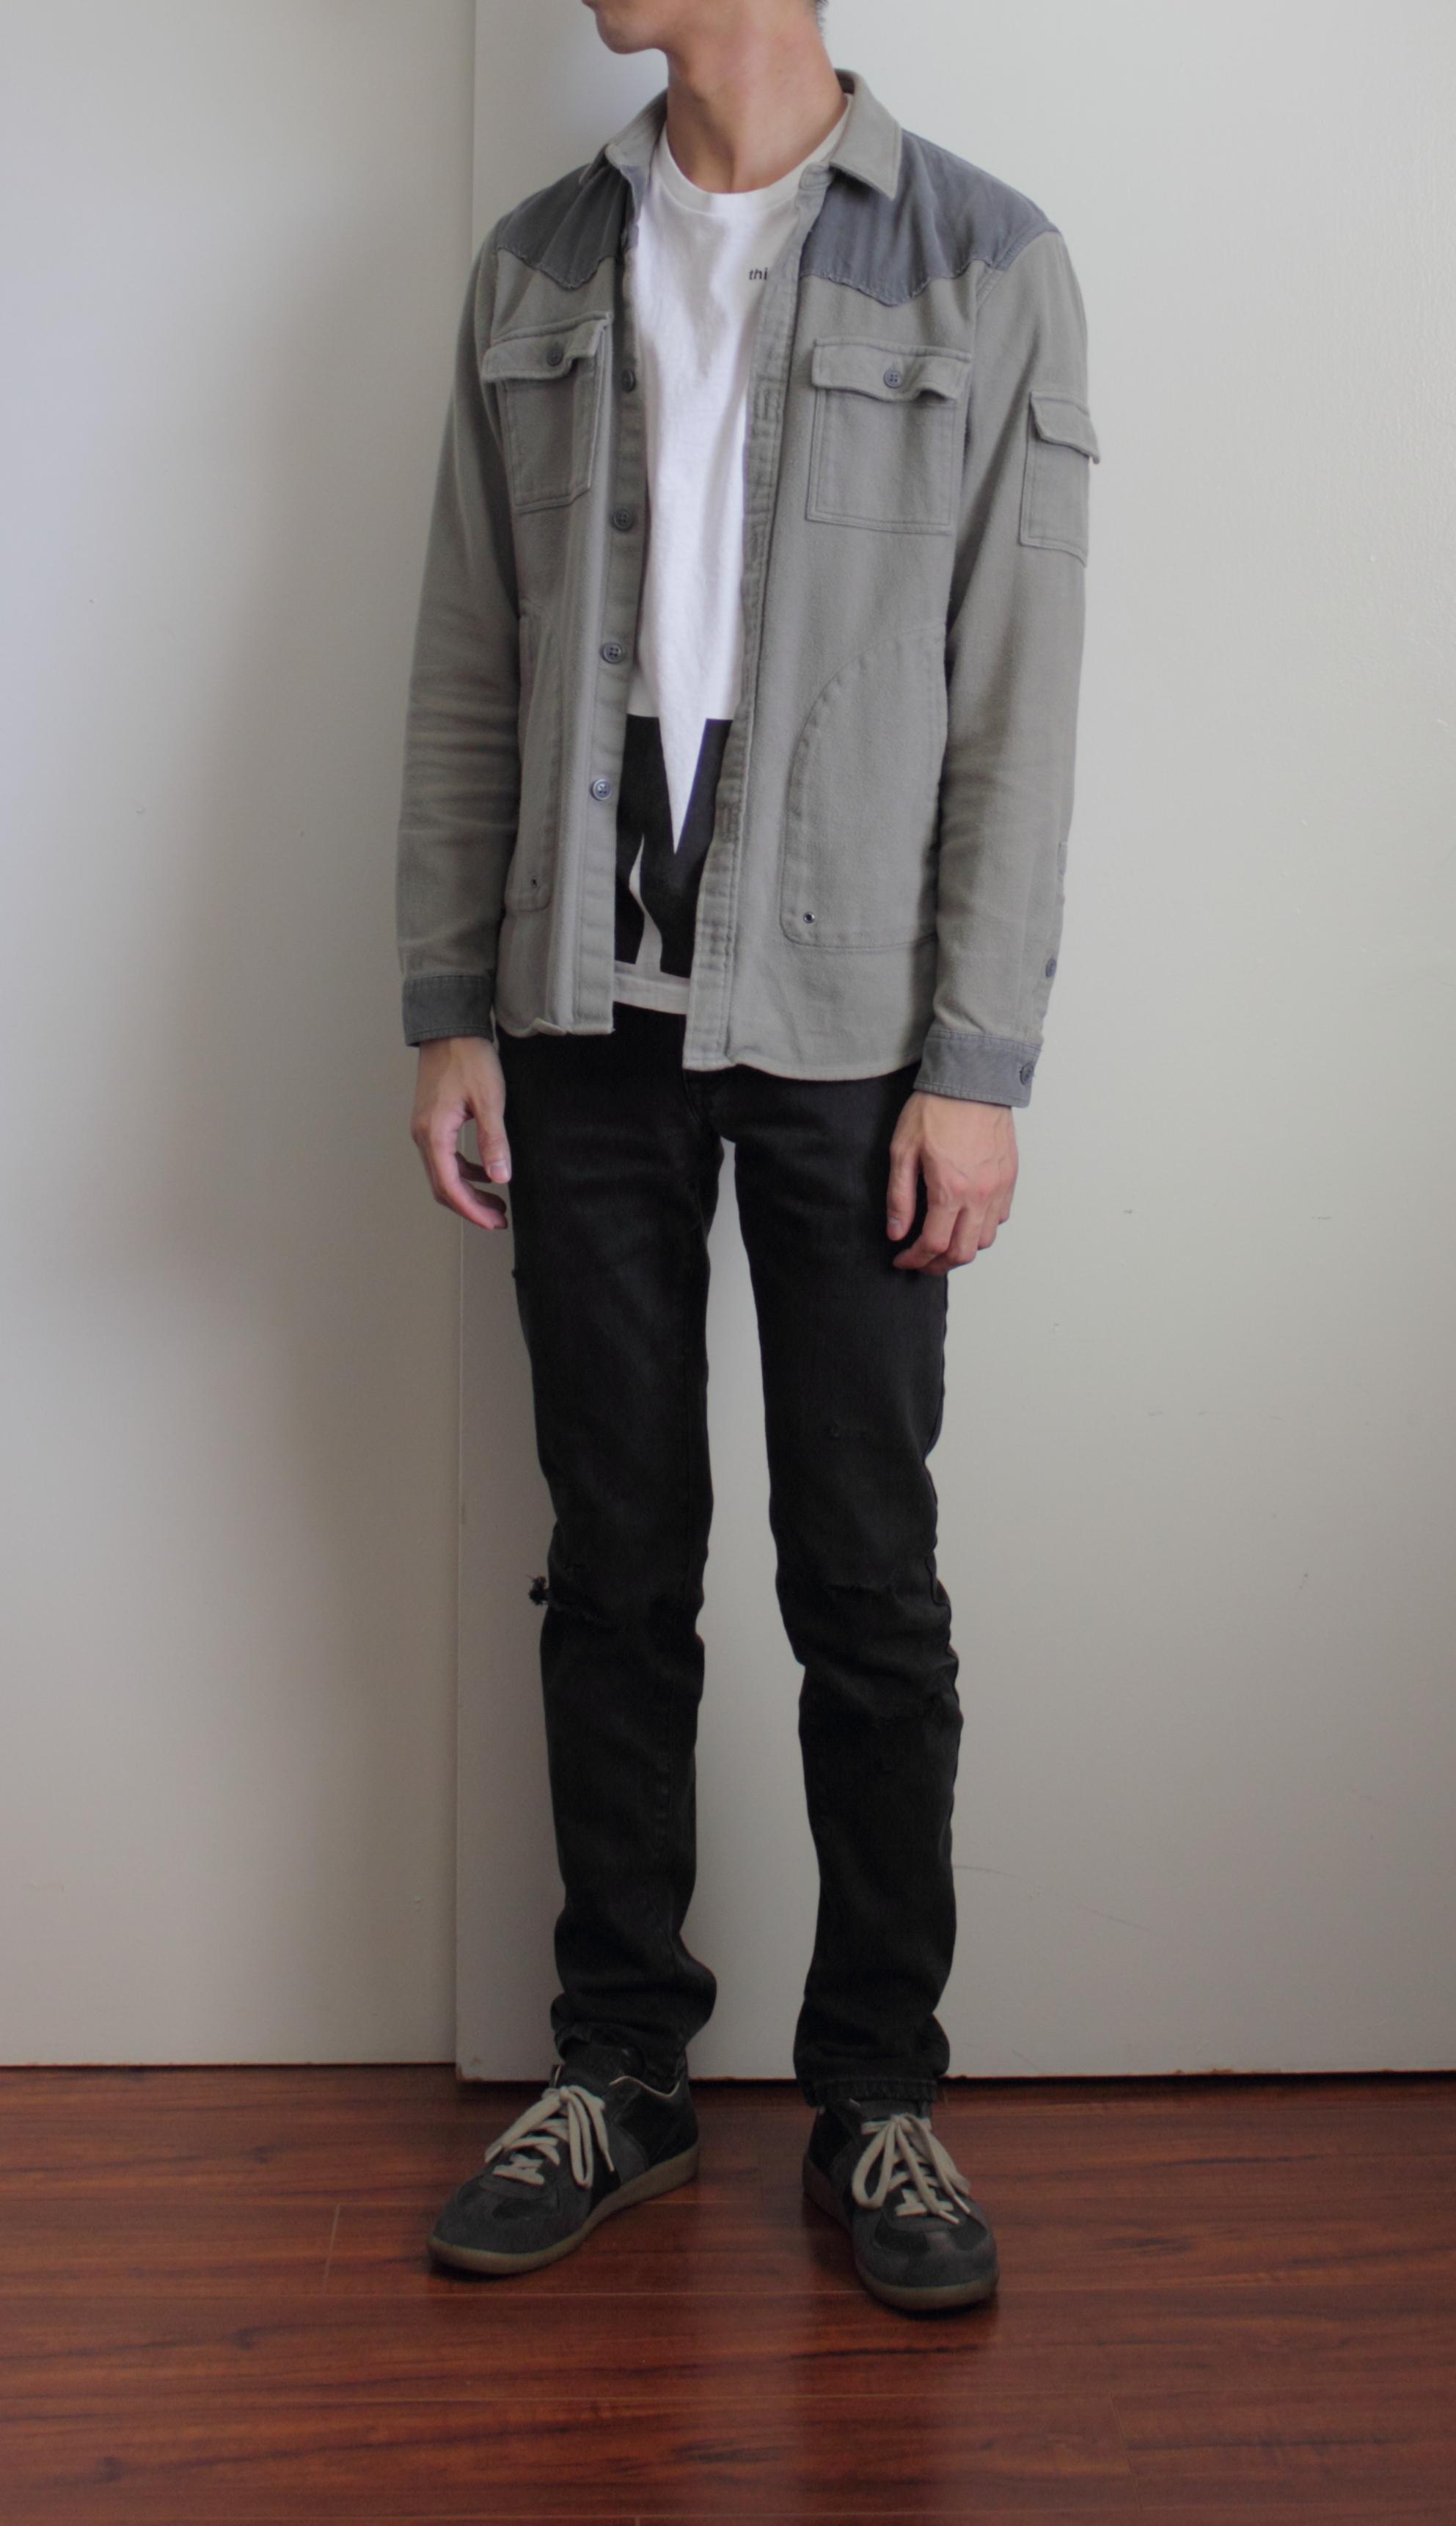 Reddit Male Fashion Adivce